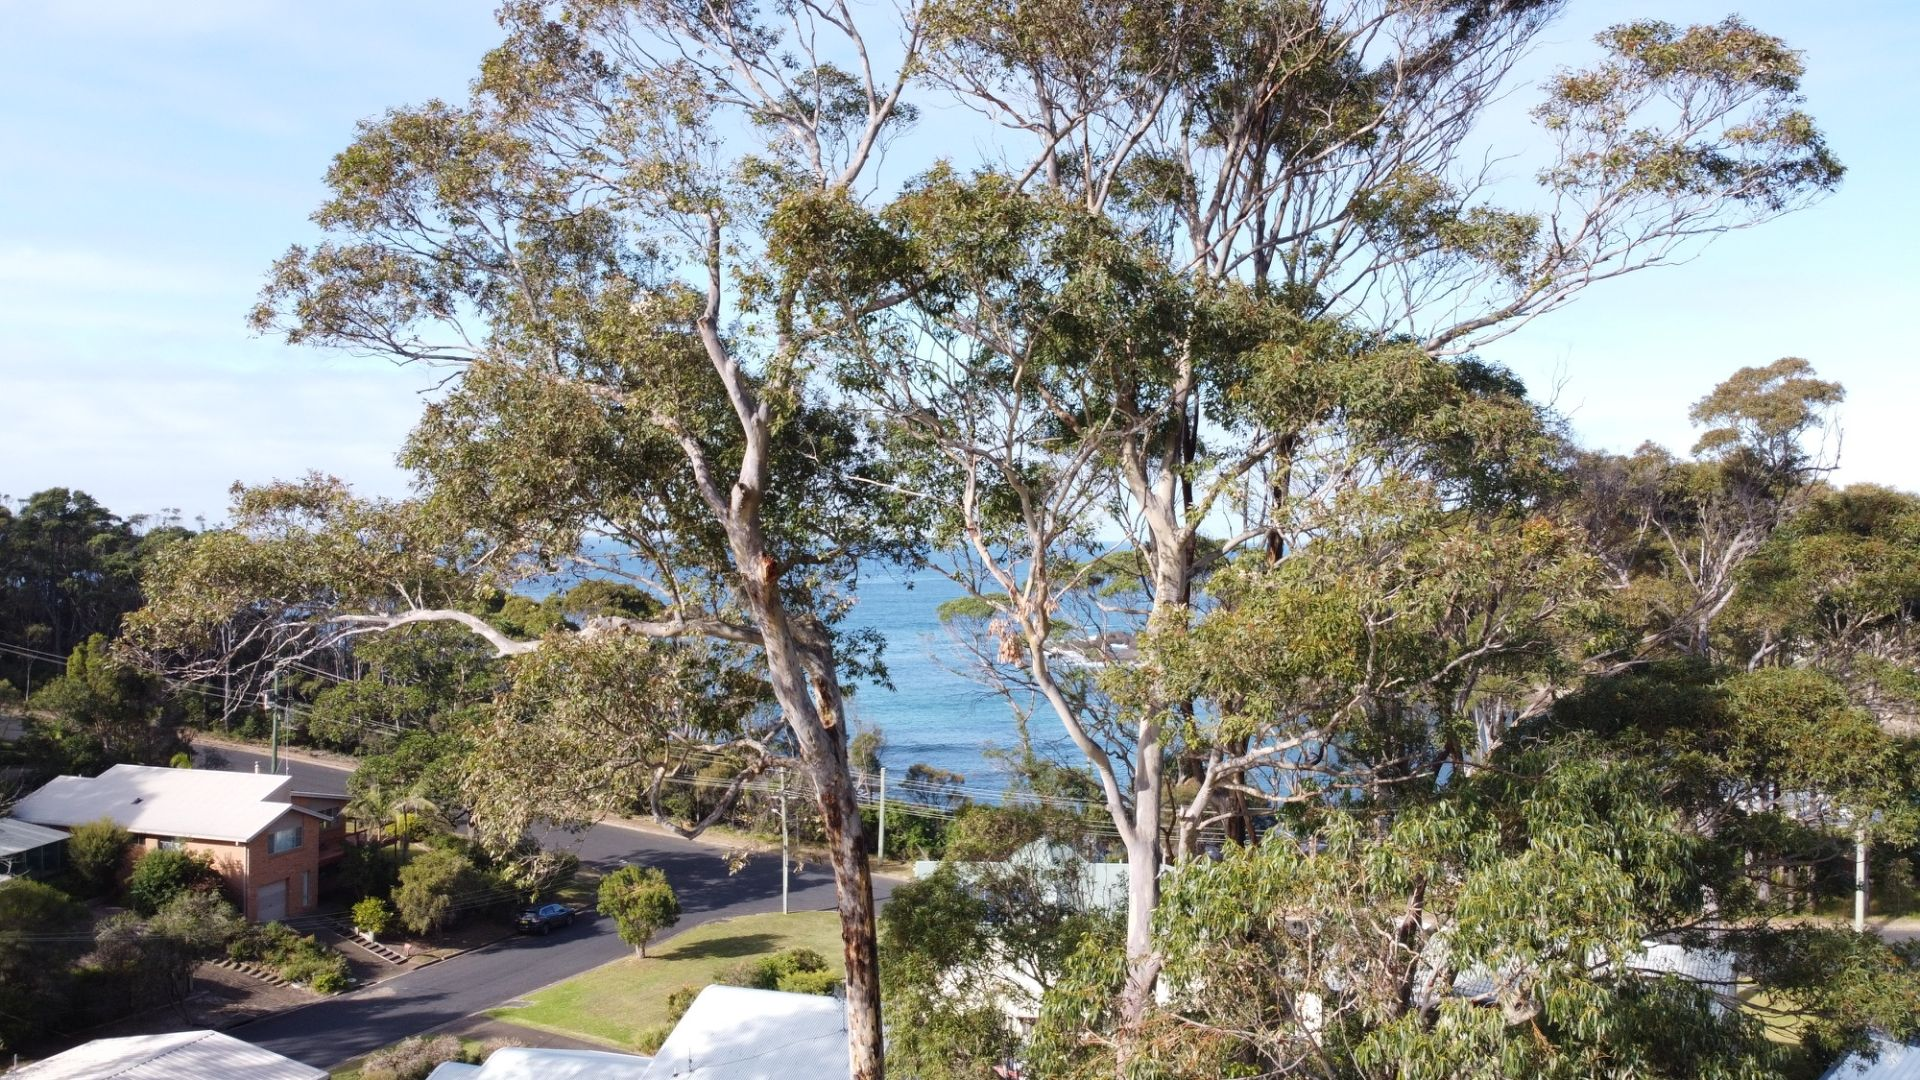 2/350 George Bass  Drive, Lilli Pilli NSW 2536, Image 0